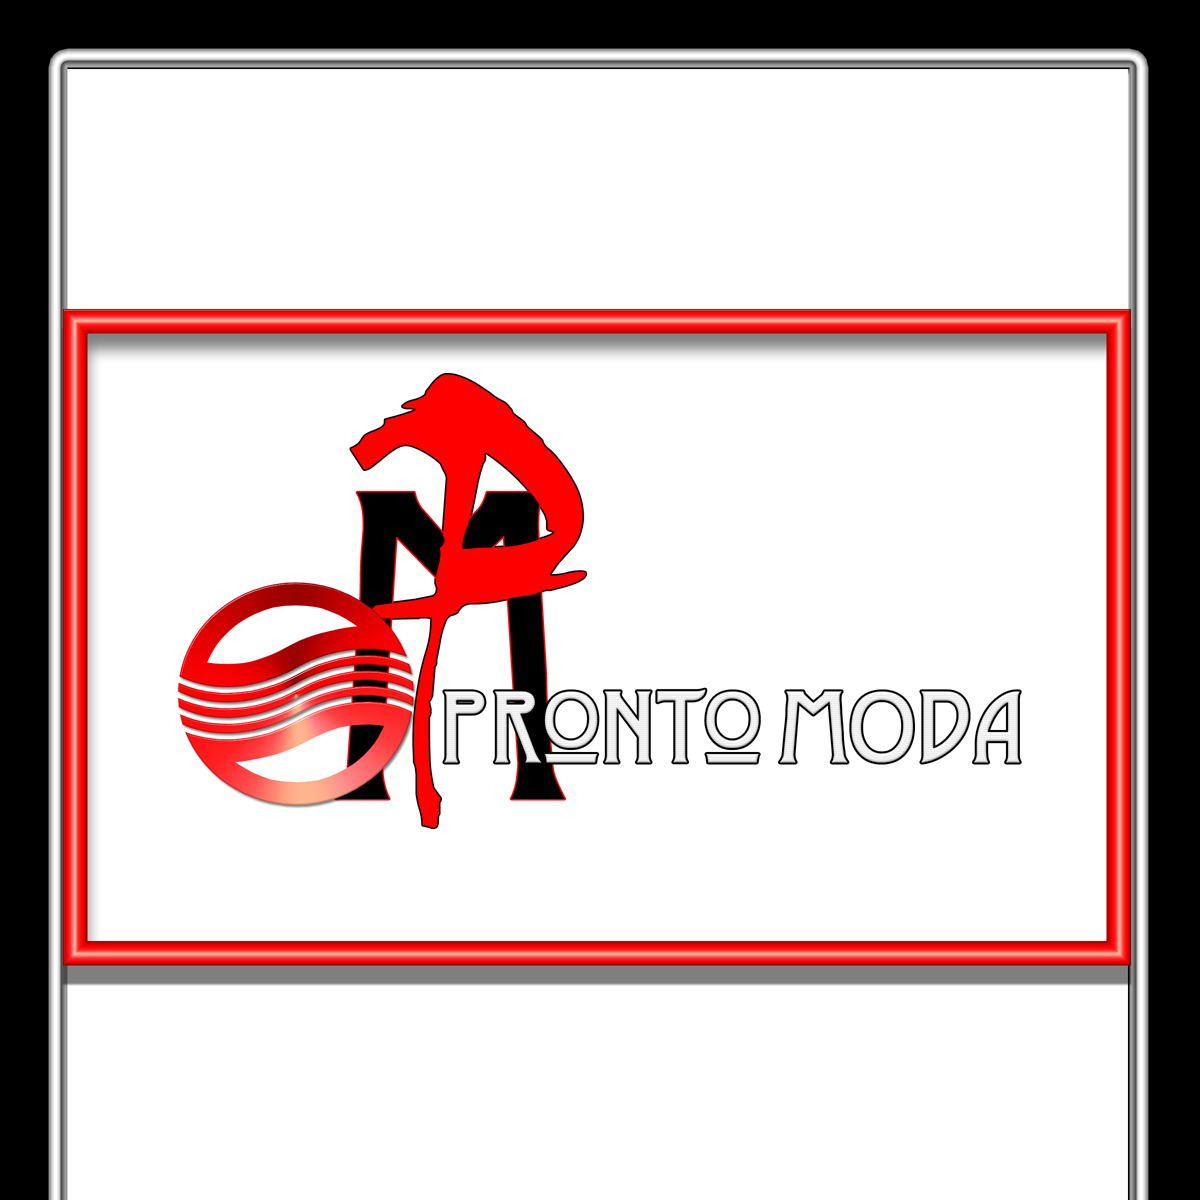 Logo Design by MITUCA ANDREI - Entry No. 28 in the Logo Design Contest Captivating Logo Design for Pronto moda.